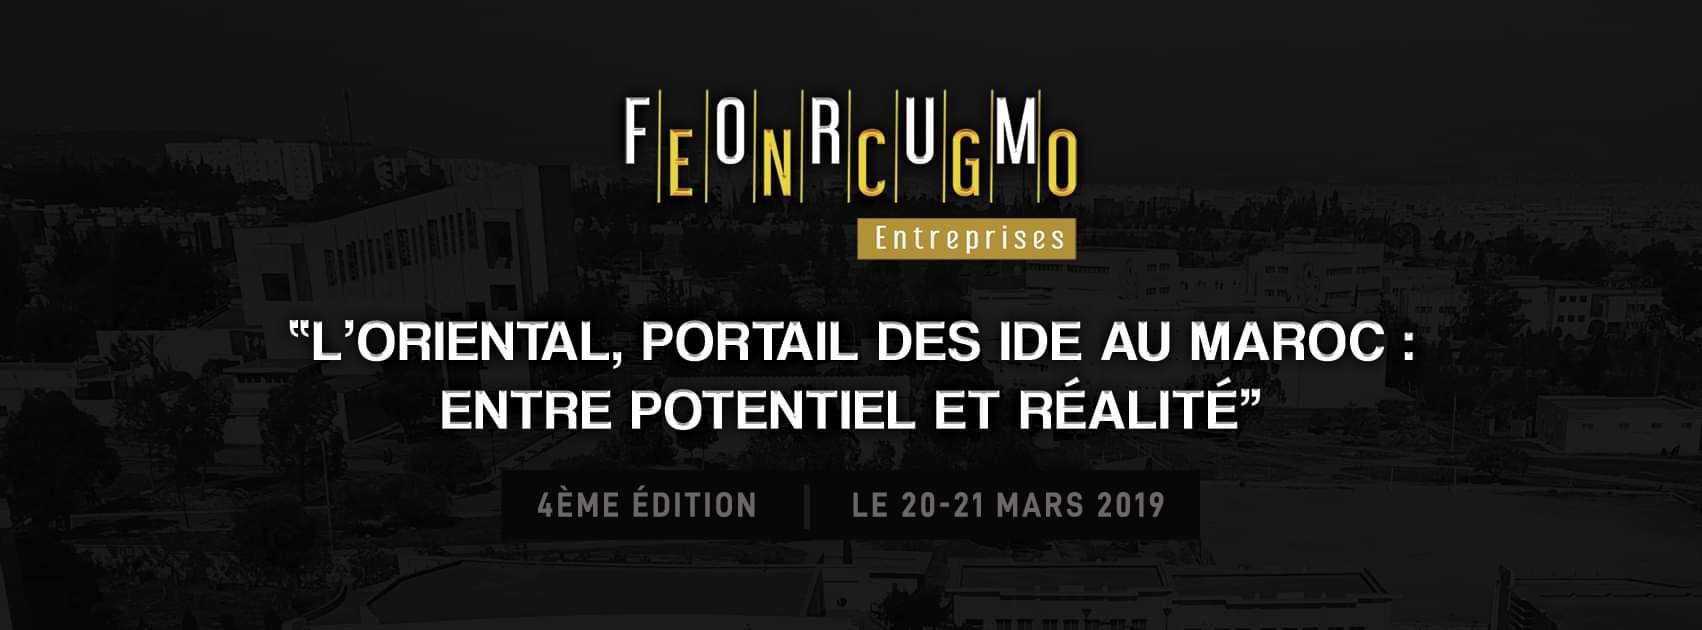 Forum ENCGO-Entreprises